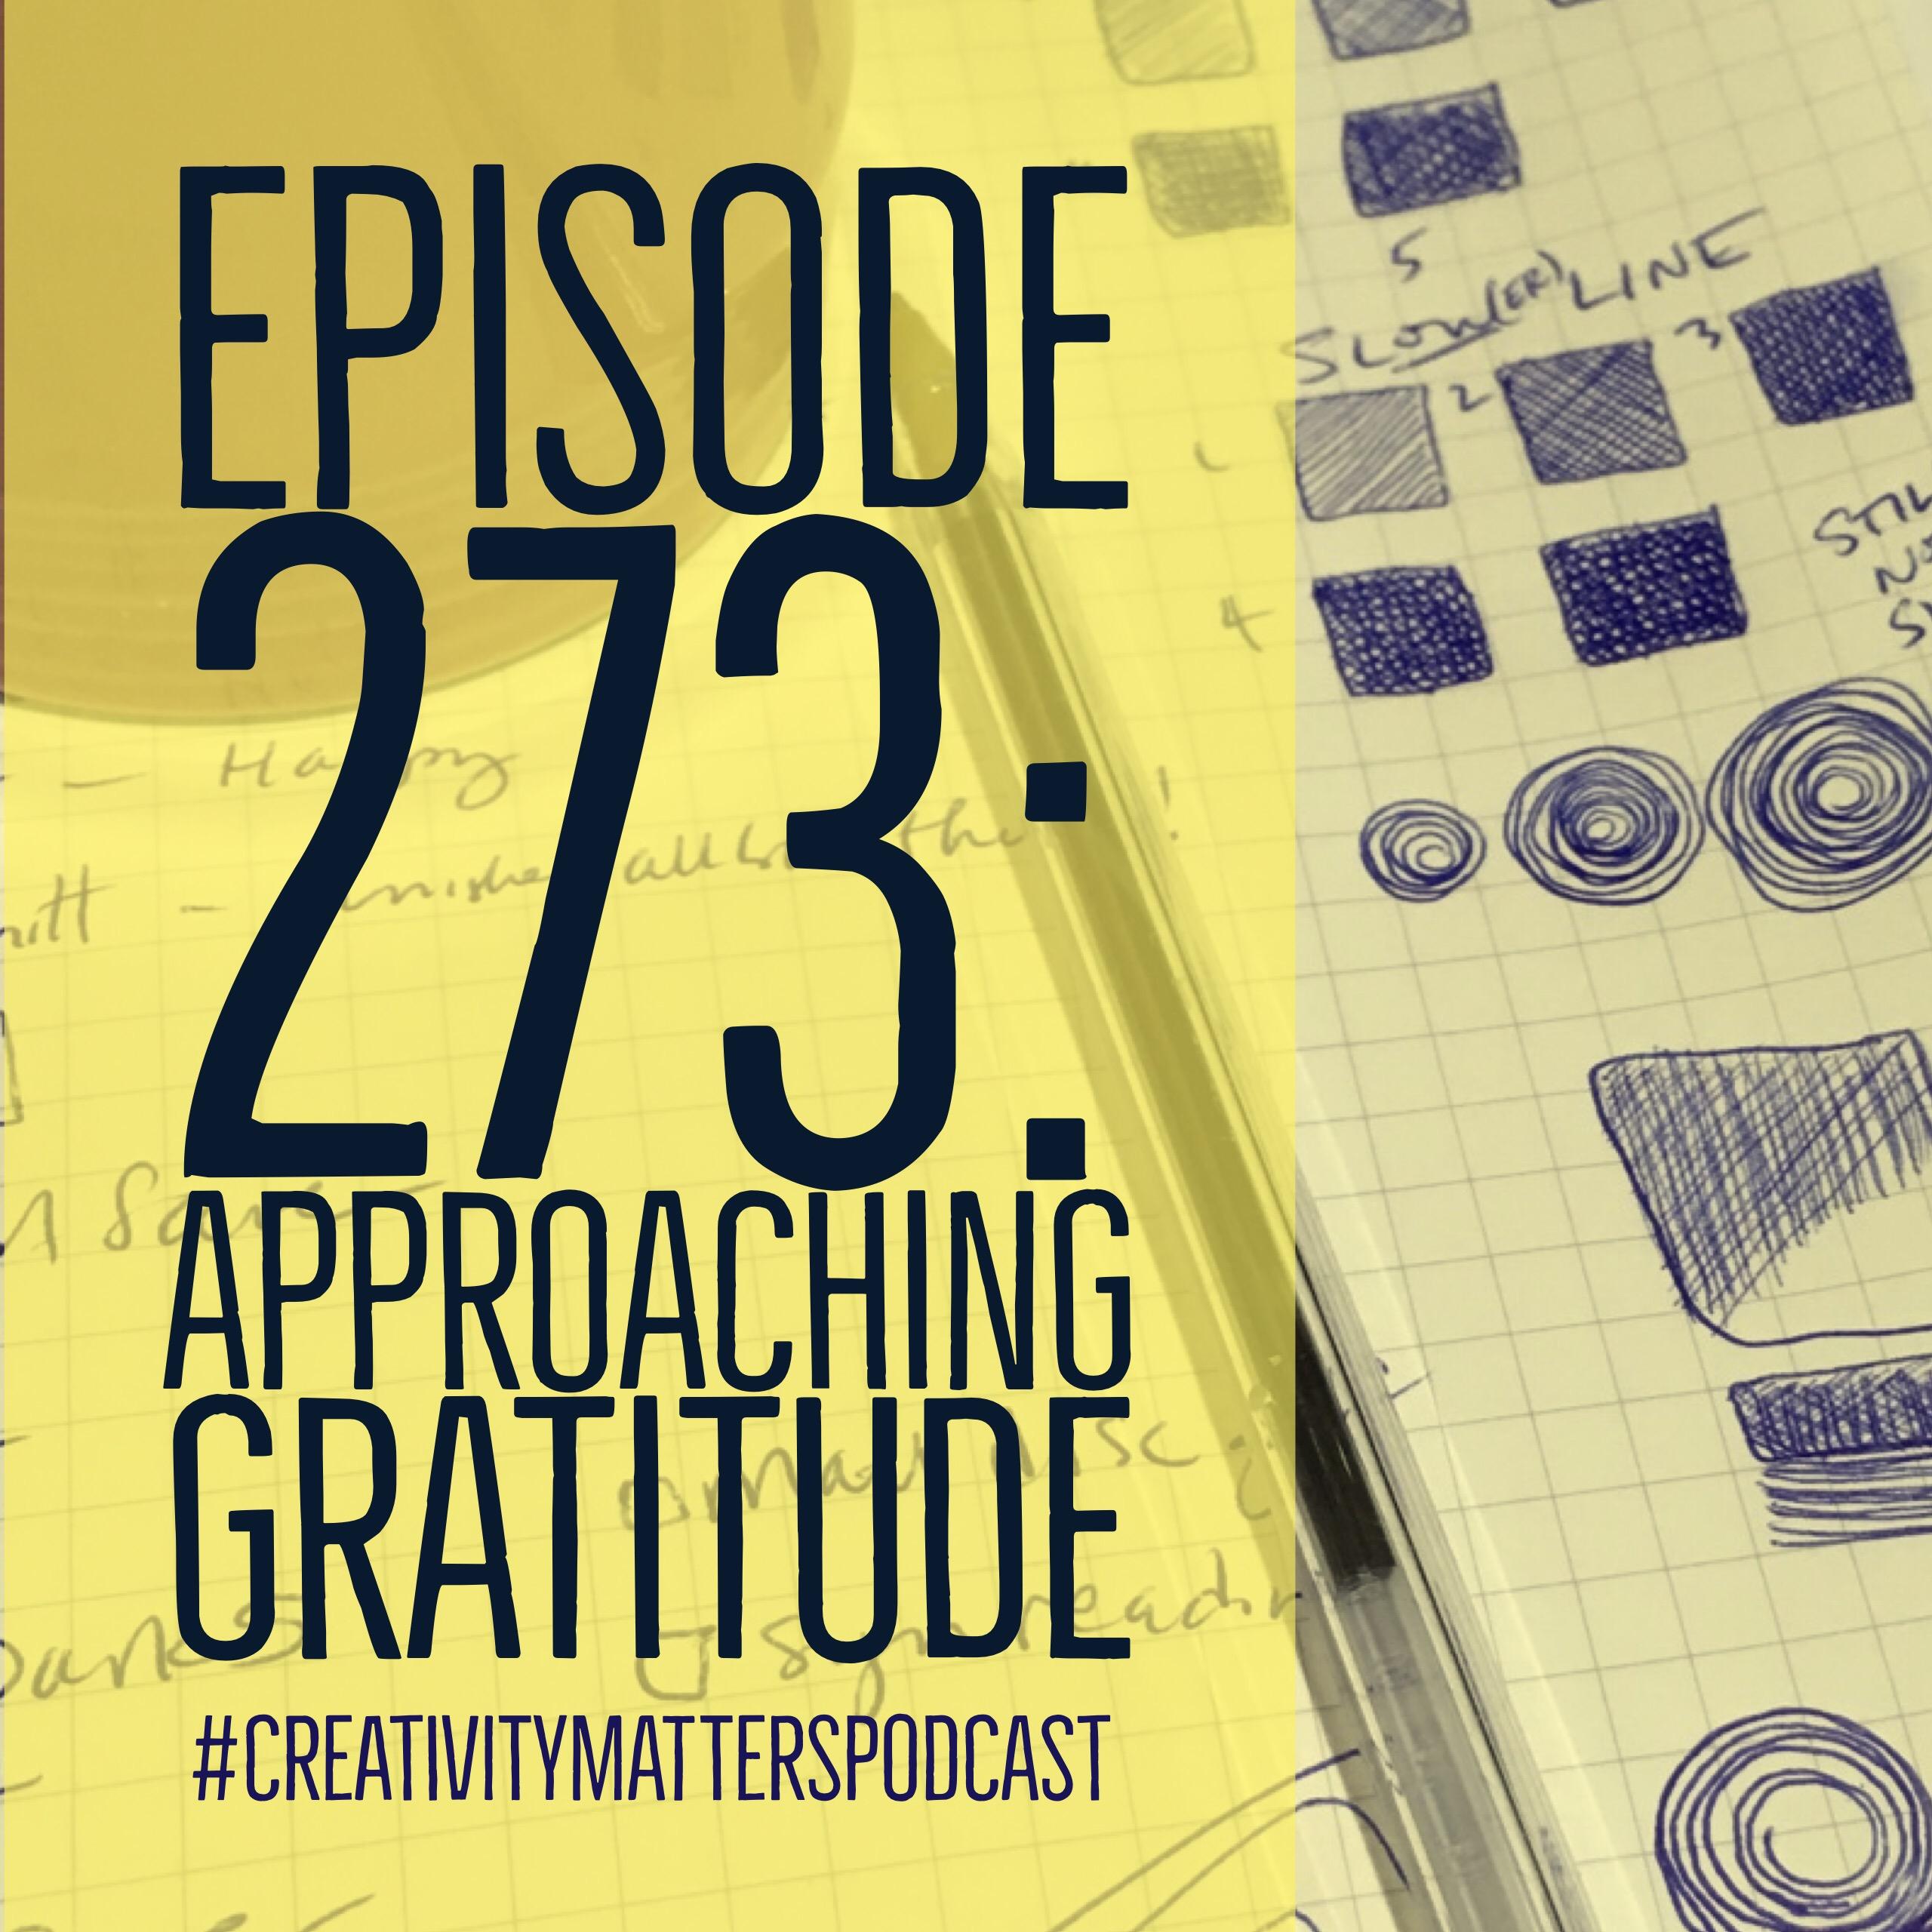 Episode 273: Approaching Gratitude